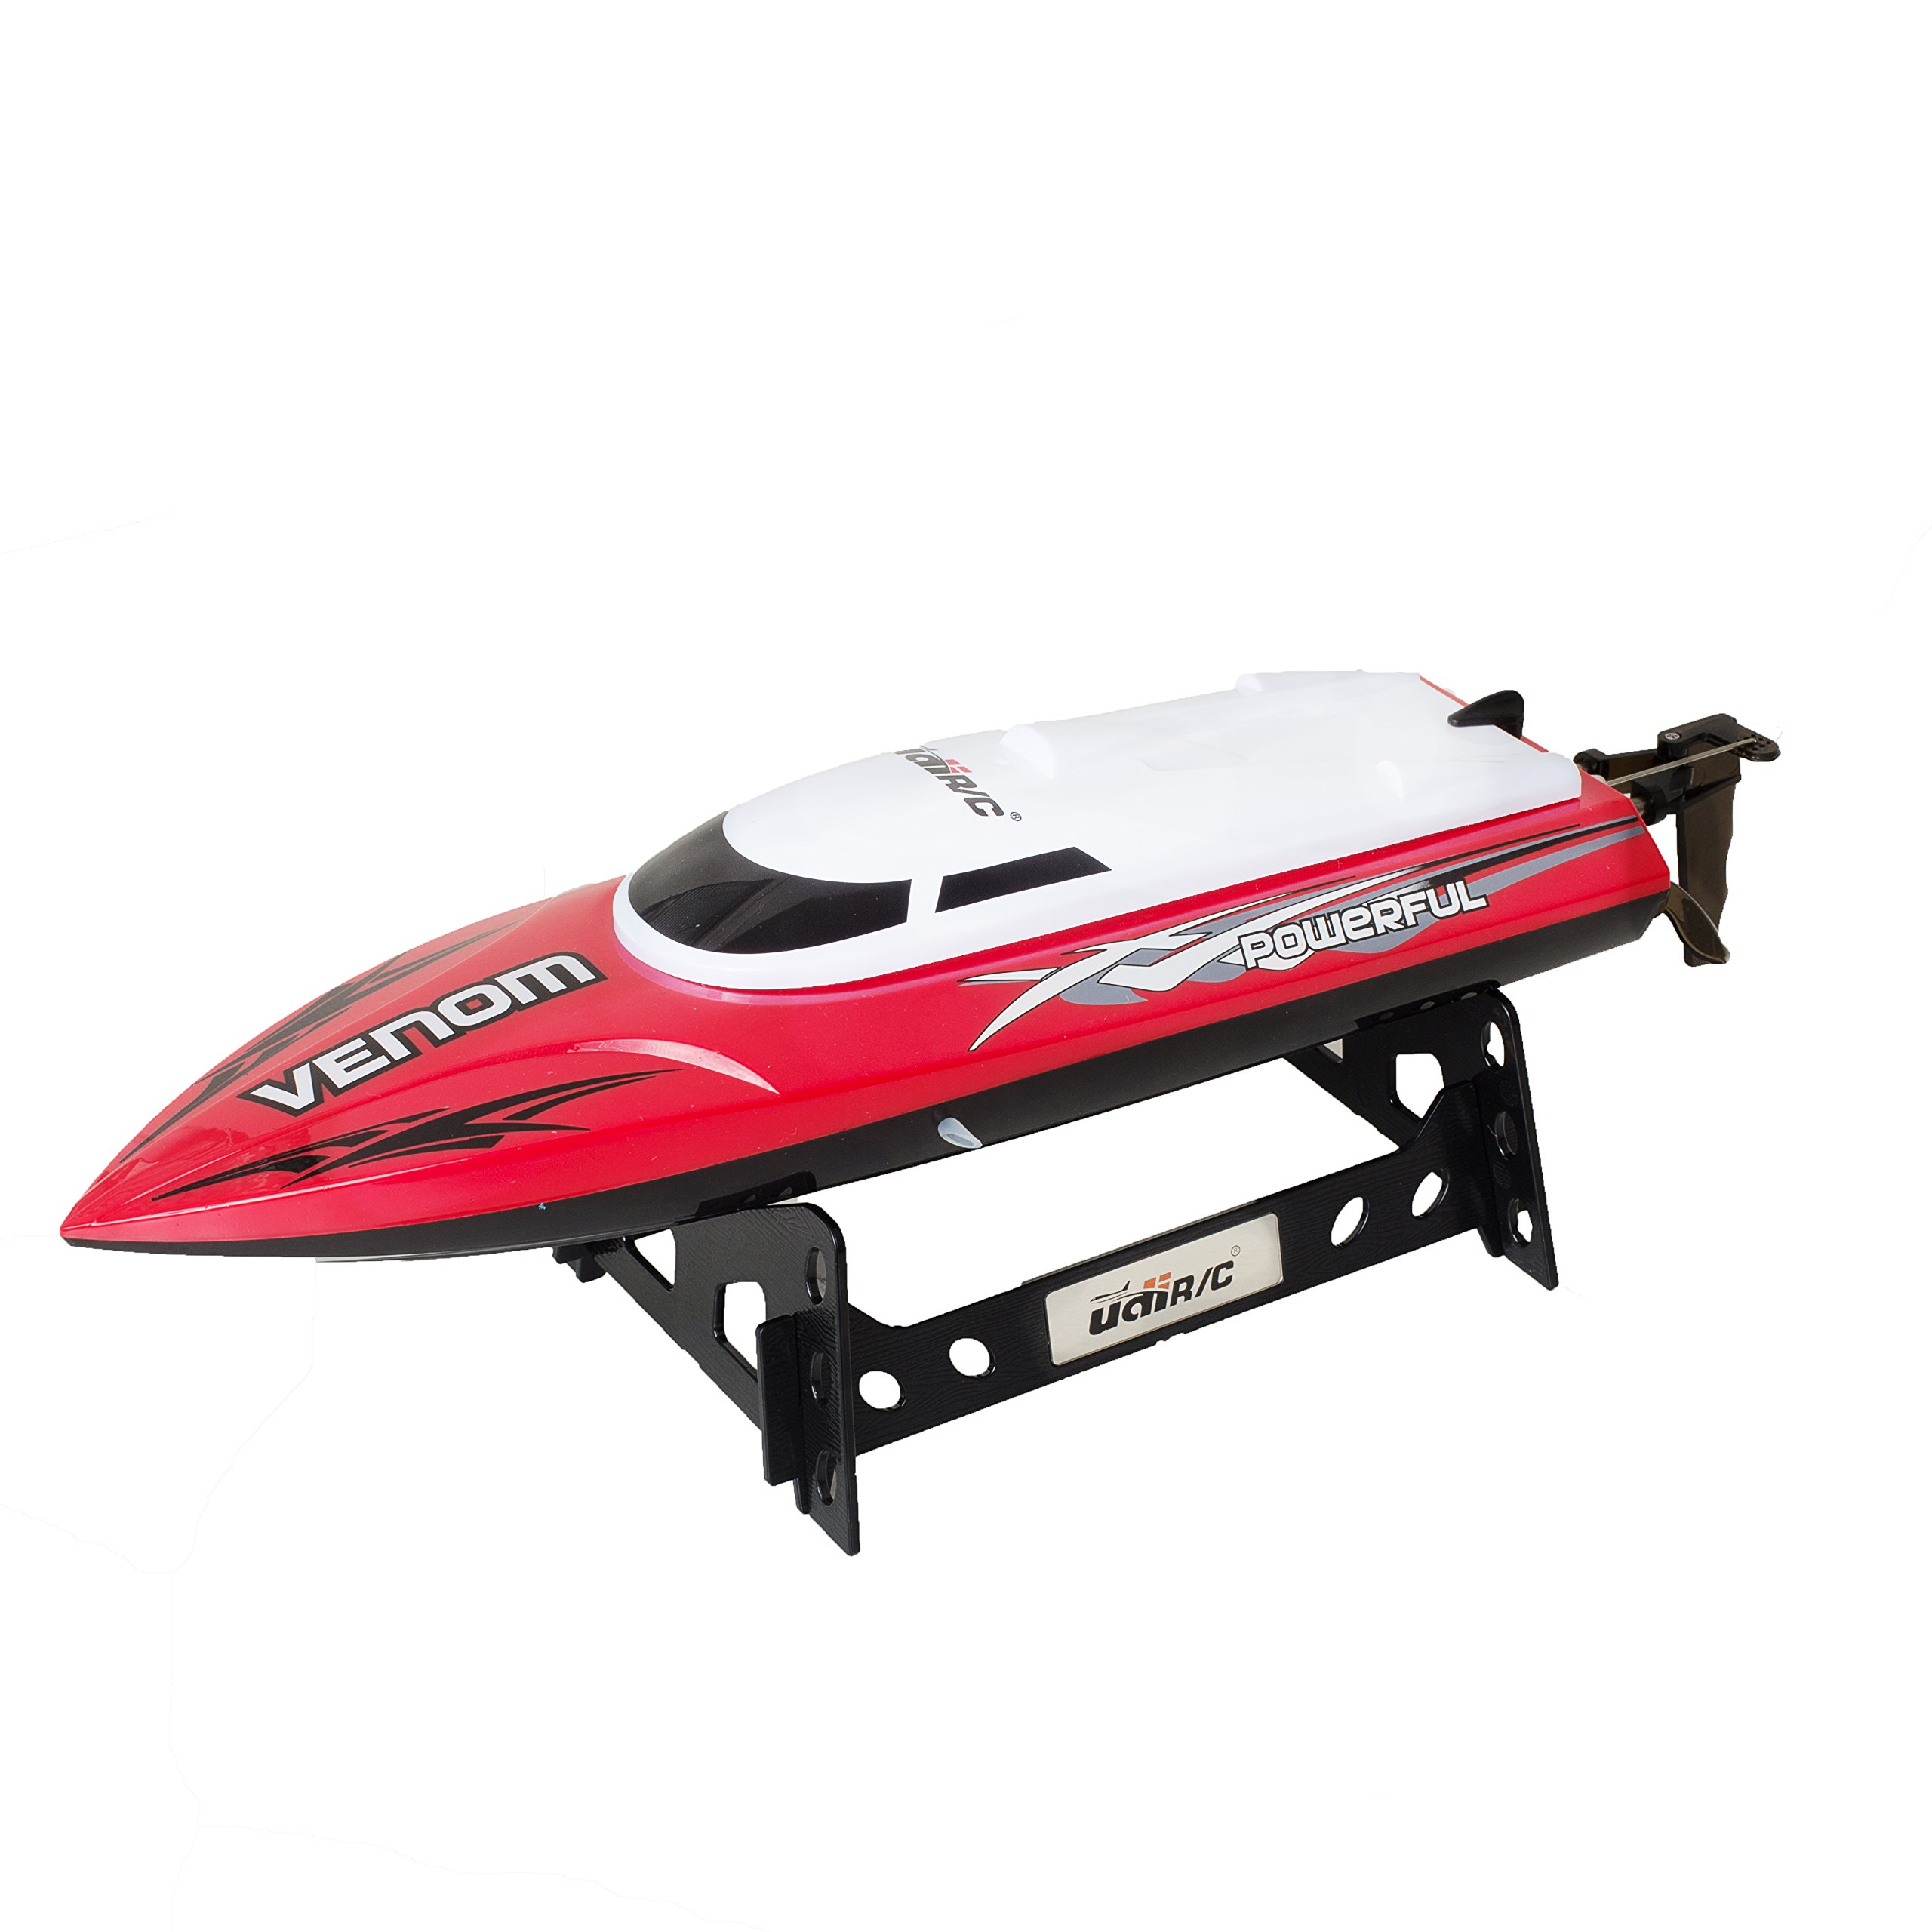 UDI001 Venom Remote Control Boat - High Speed Venom RC Boats for Adults - Remote Control Boats for Lakes with 2 Batteries (Rattlesnake Red)